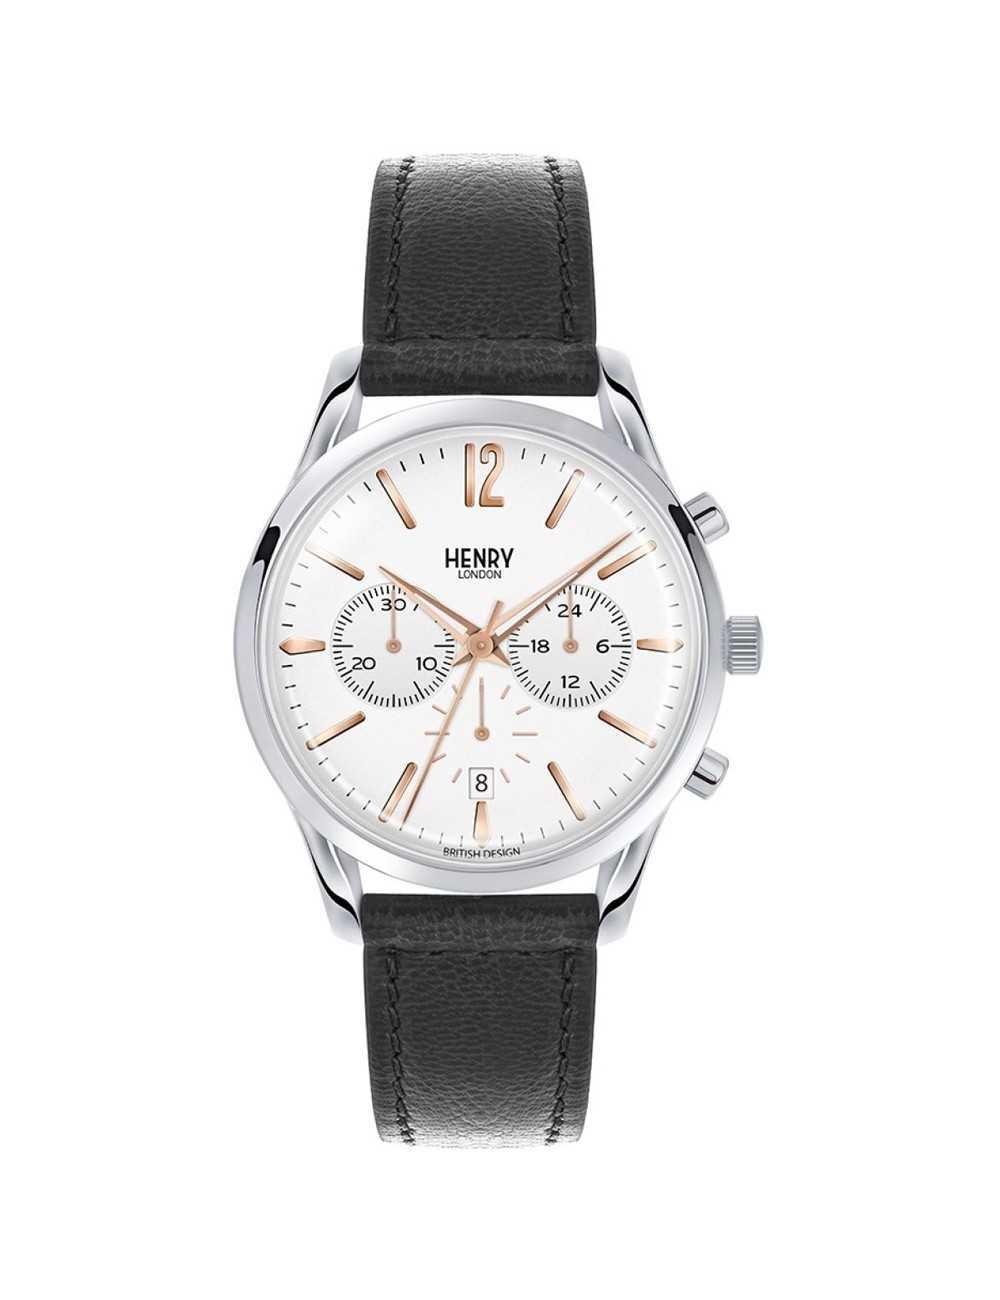 Henry London HL39-CS-0009 Highgate Ladies Watch Chronograph